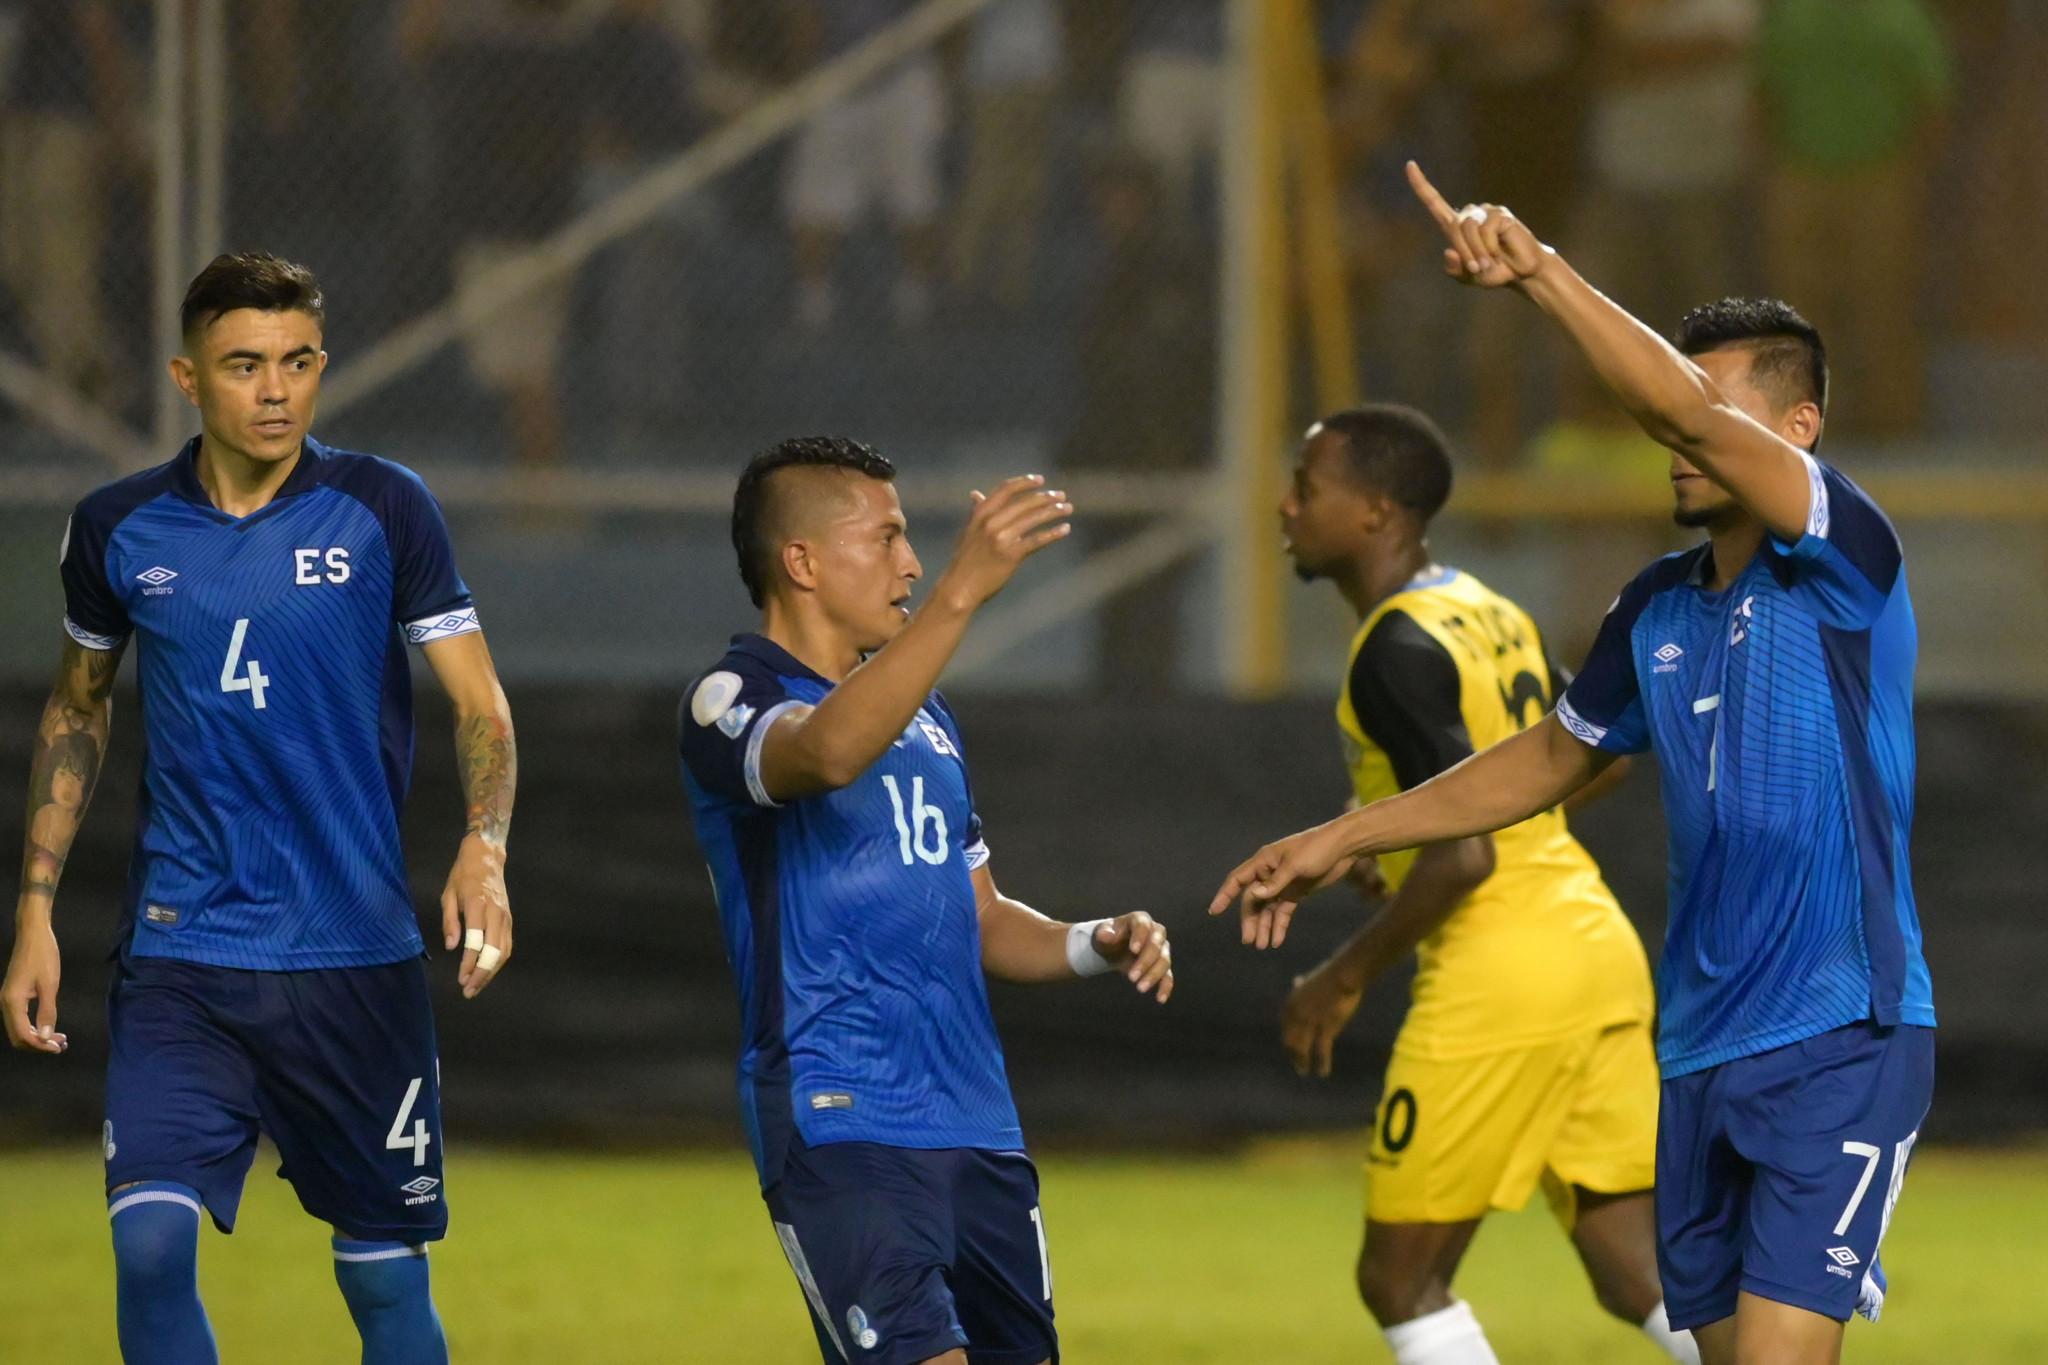 NOC helping to fund El Salvador football team training camp ahead of Tokyo 2020 qualifier